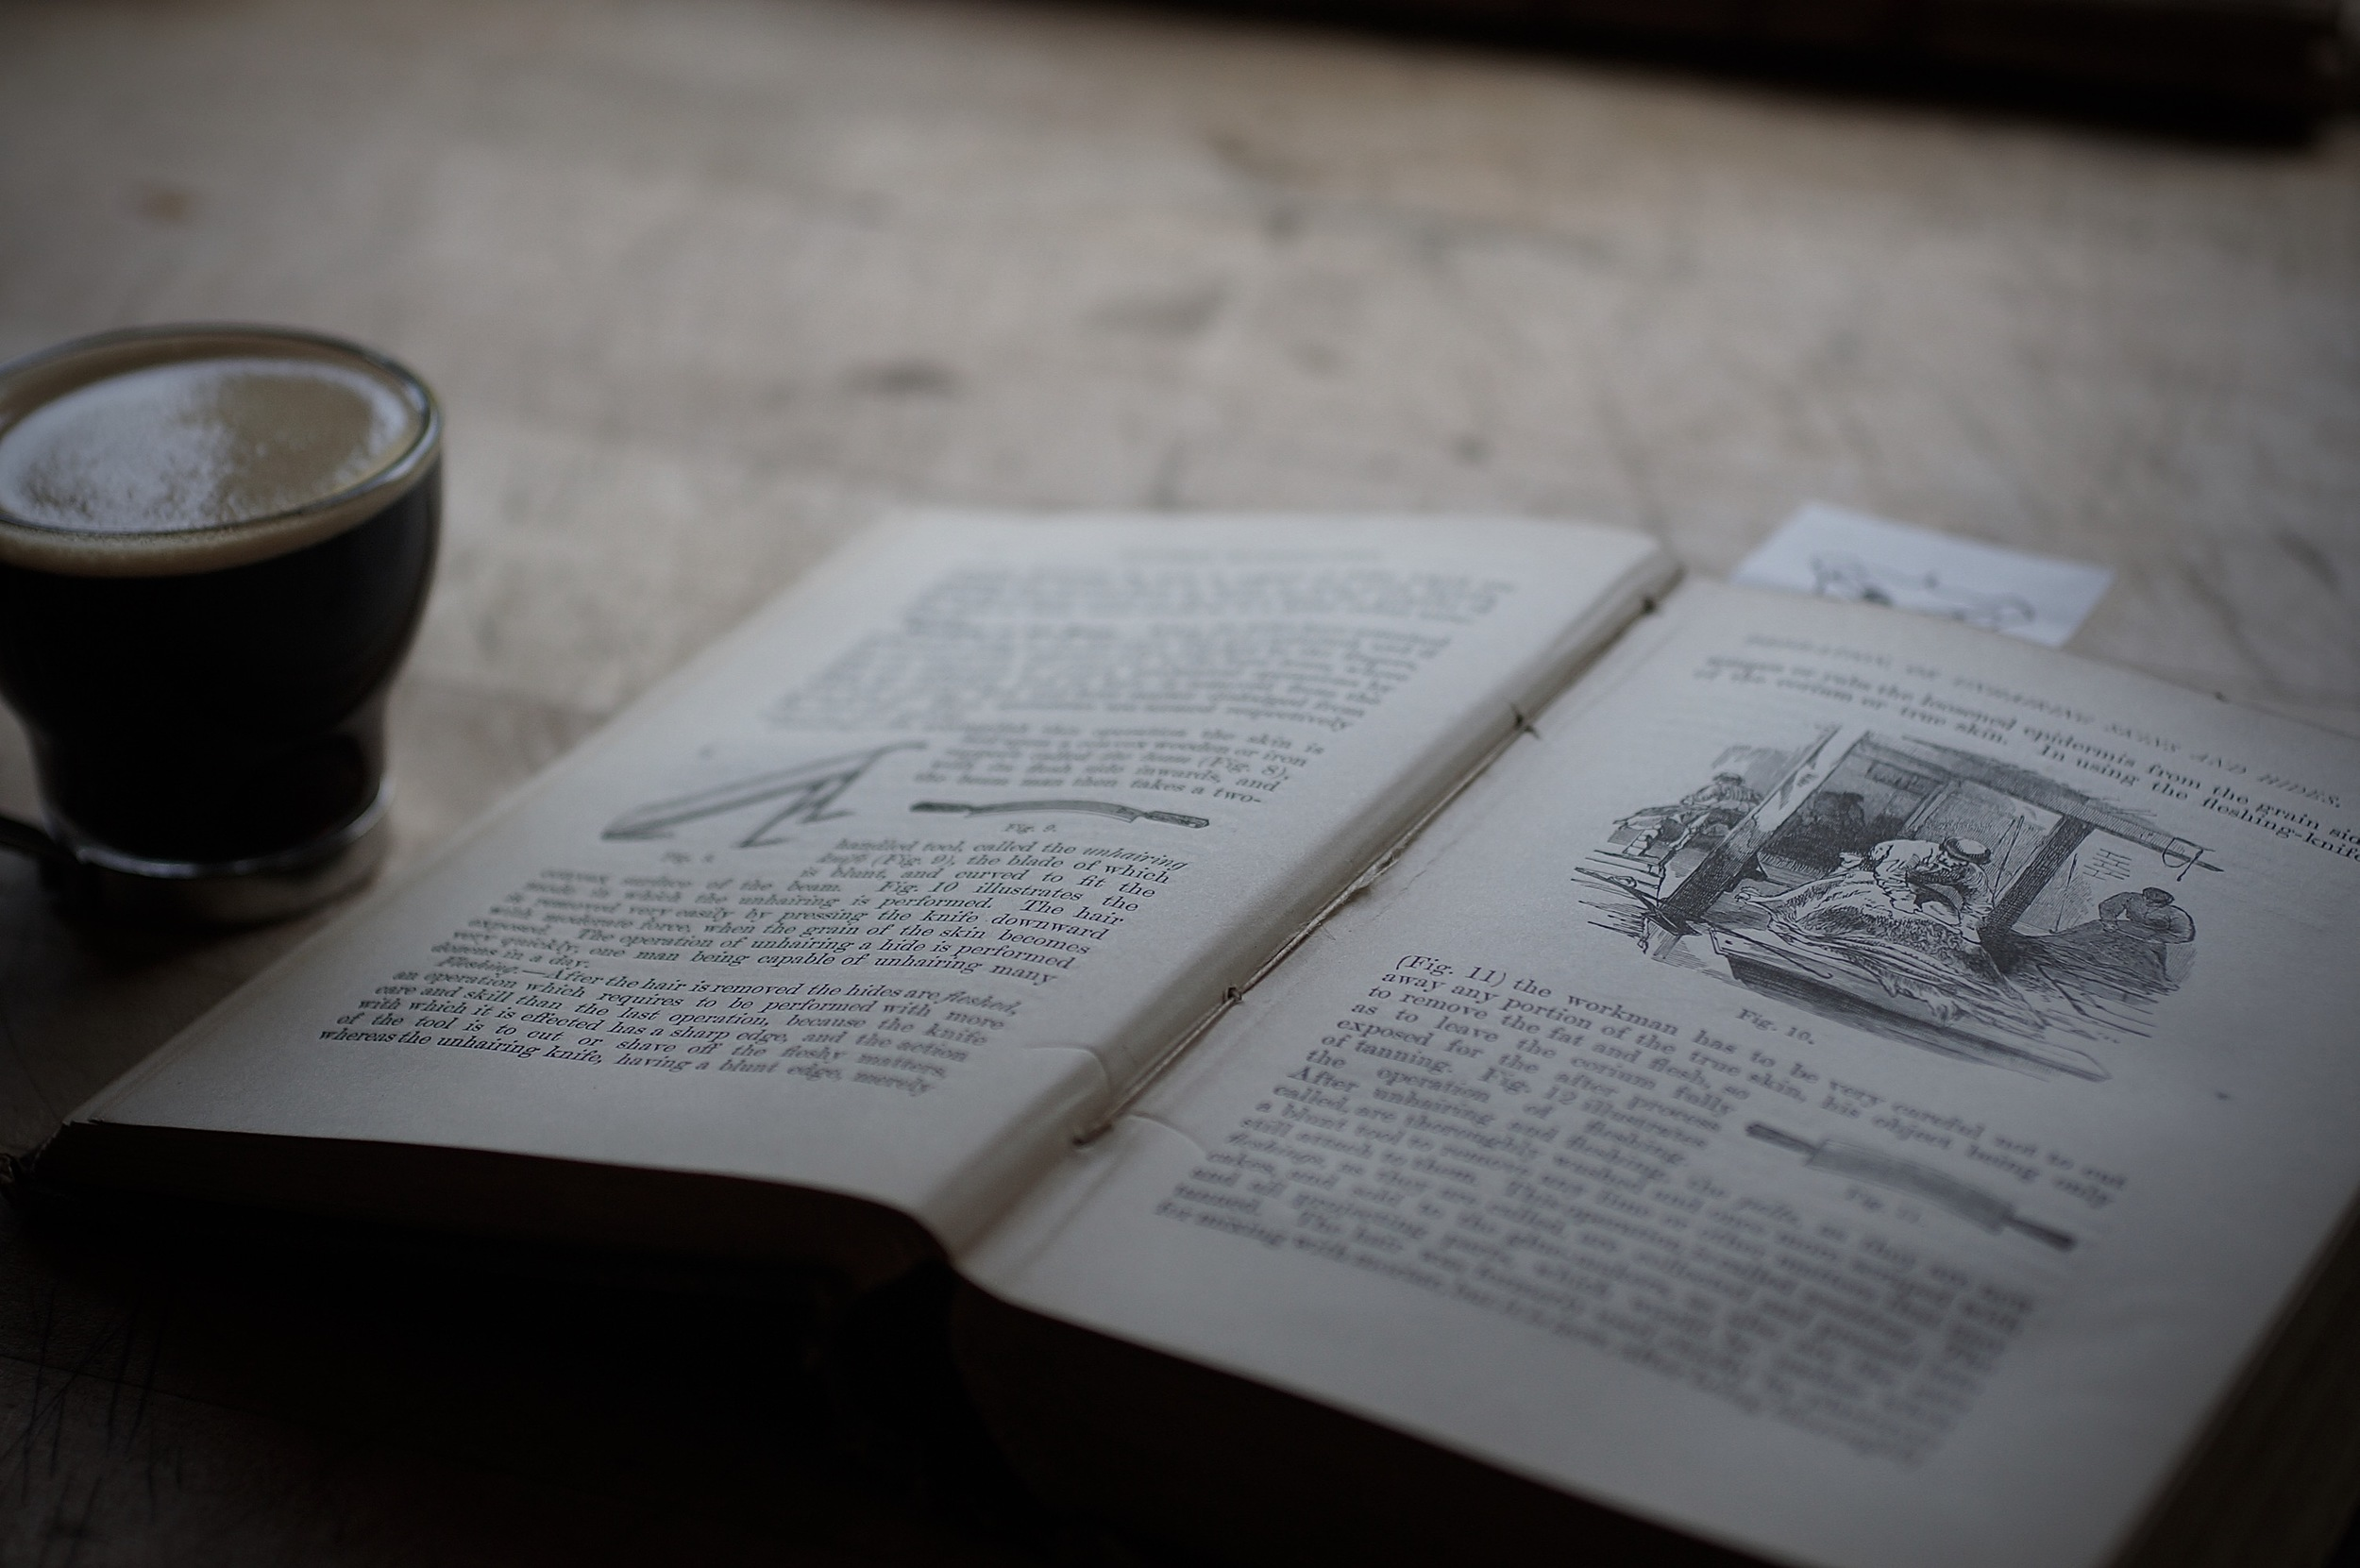 A book and an espresso :)